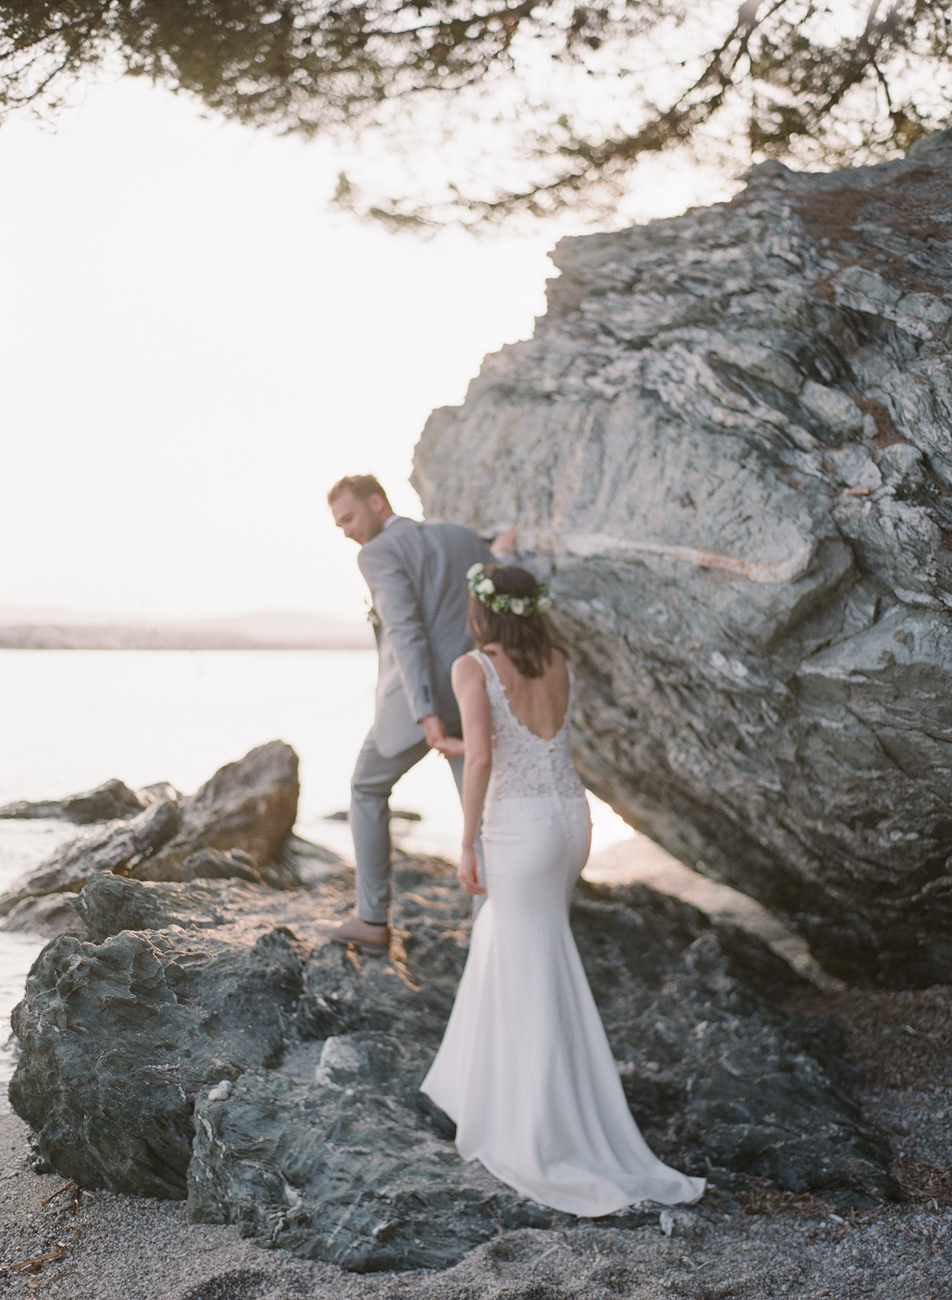 residence-cap-brun-toulon-mariage-photographe-16.jpg